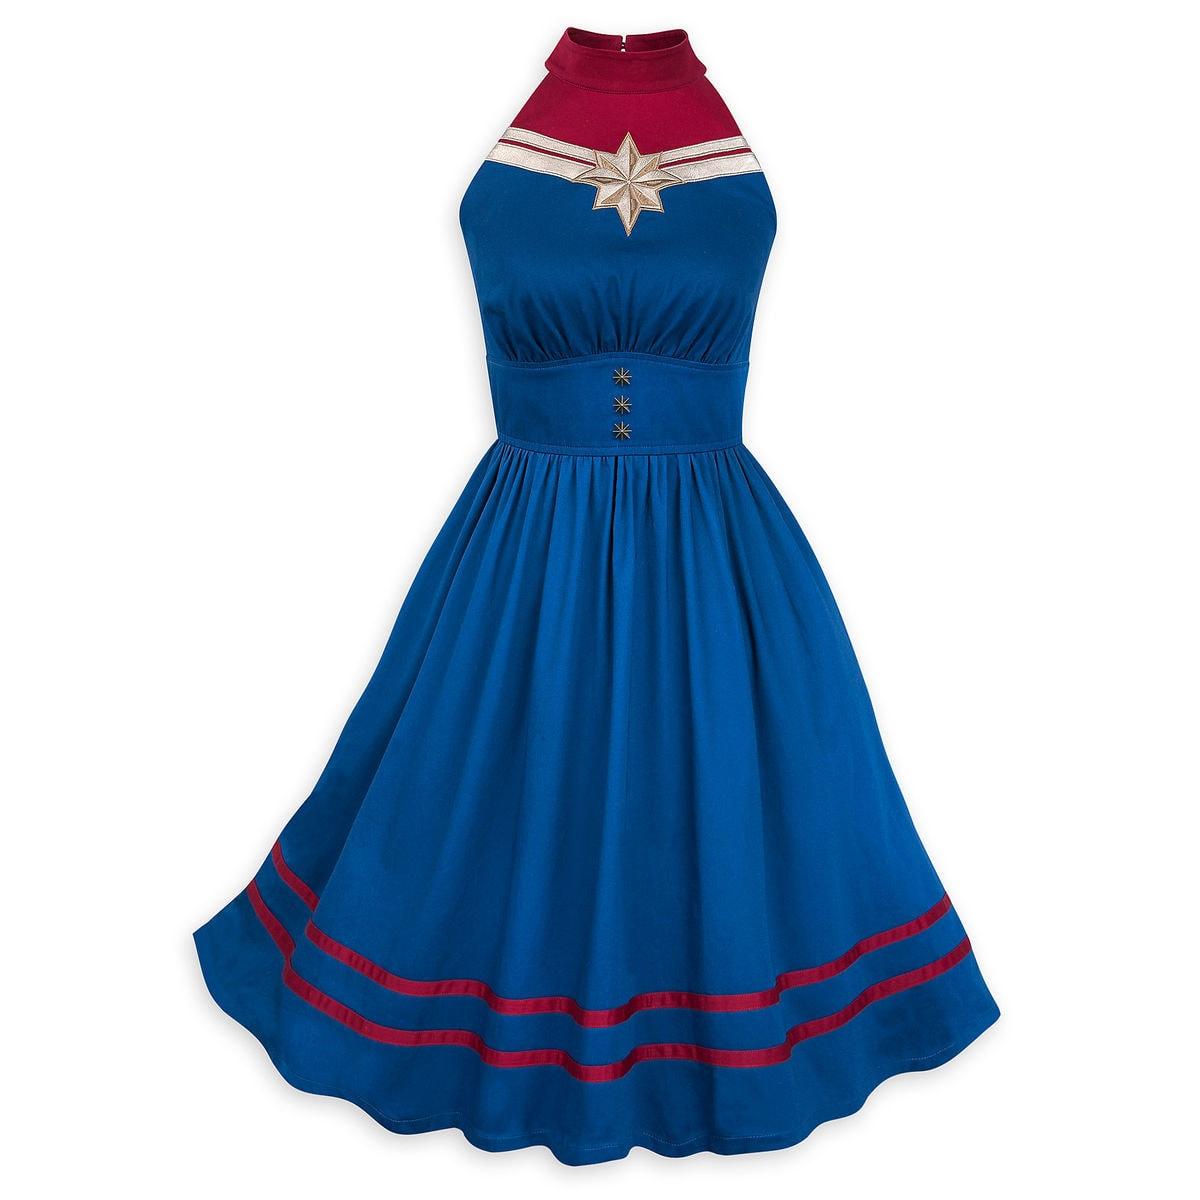 0a3175aae Disney Dress Shop Dress - Captain Marvel Dress by Her Universe